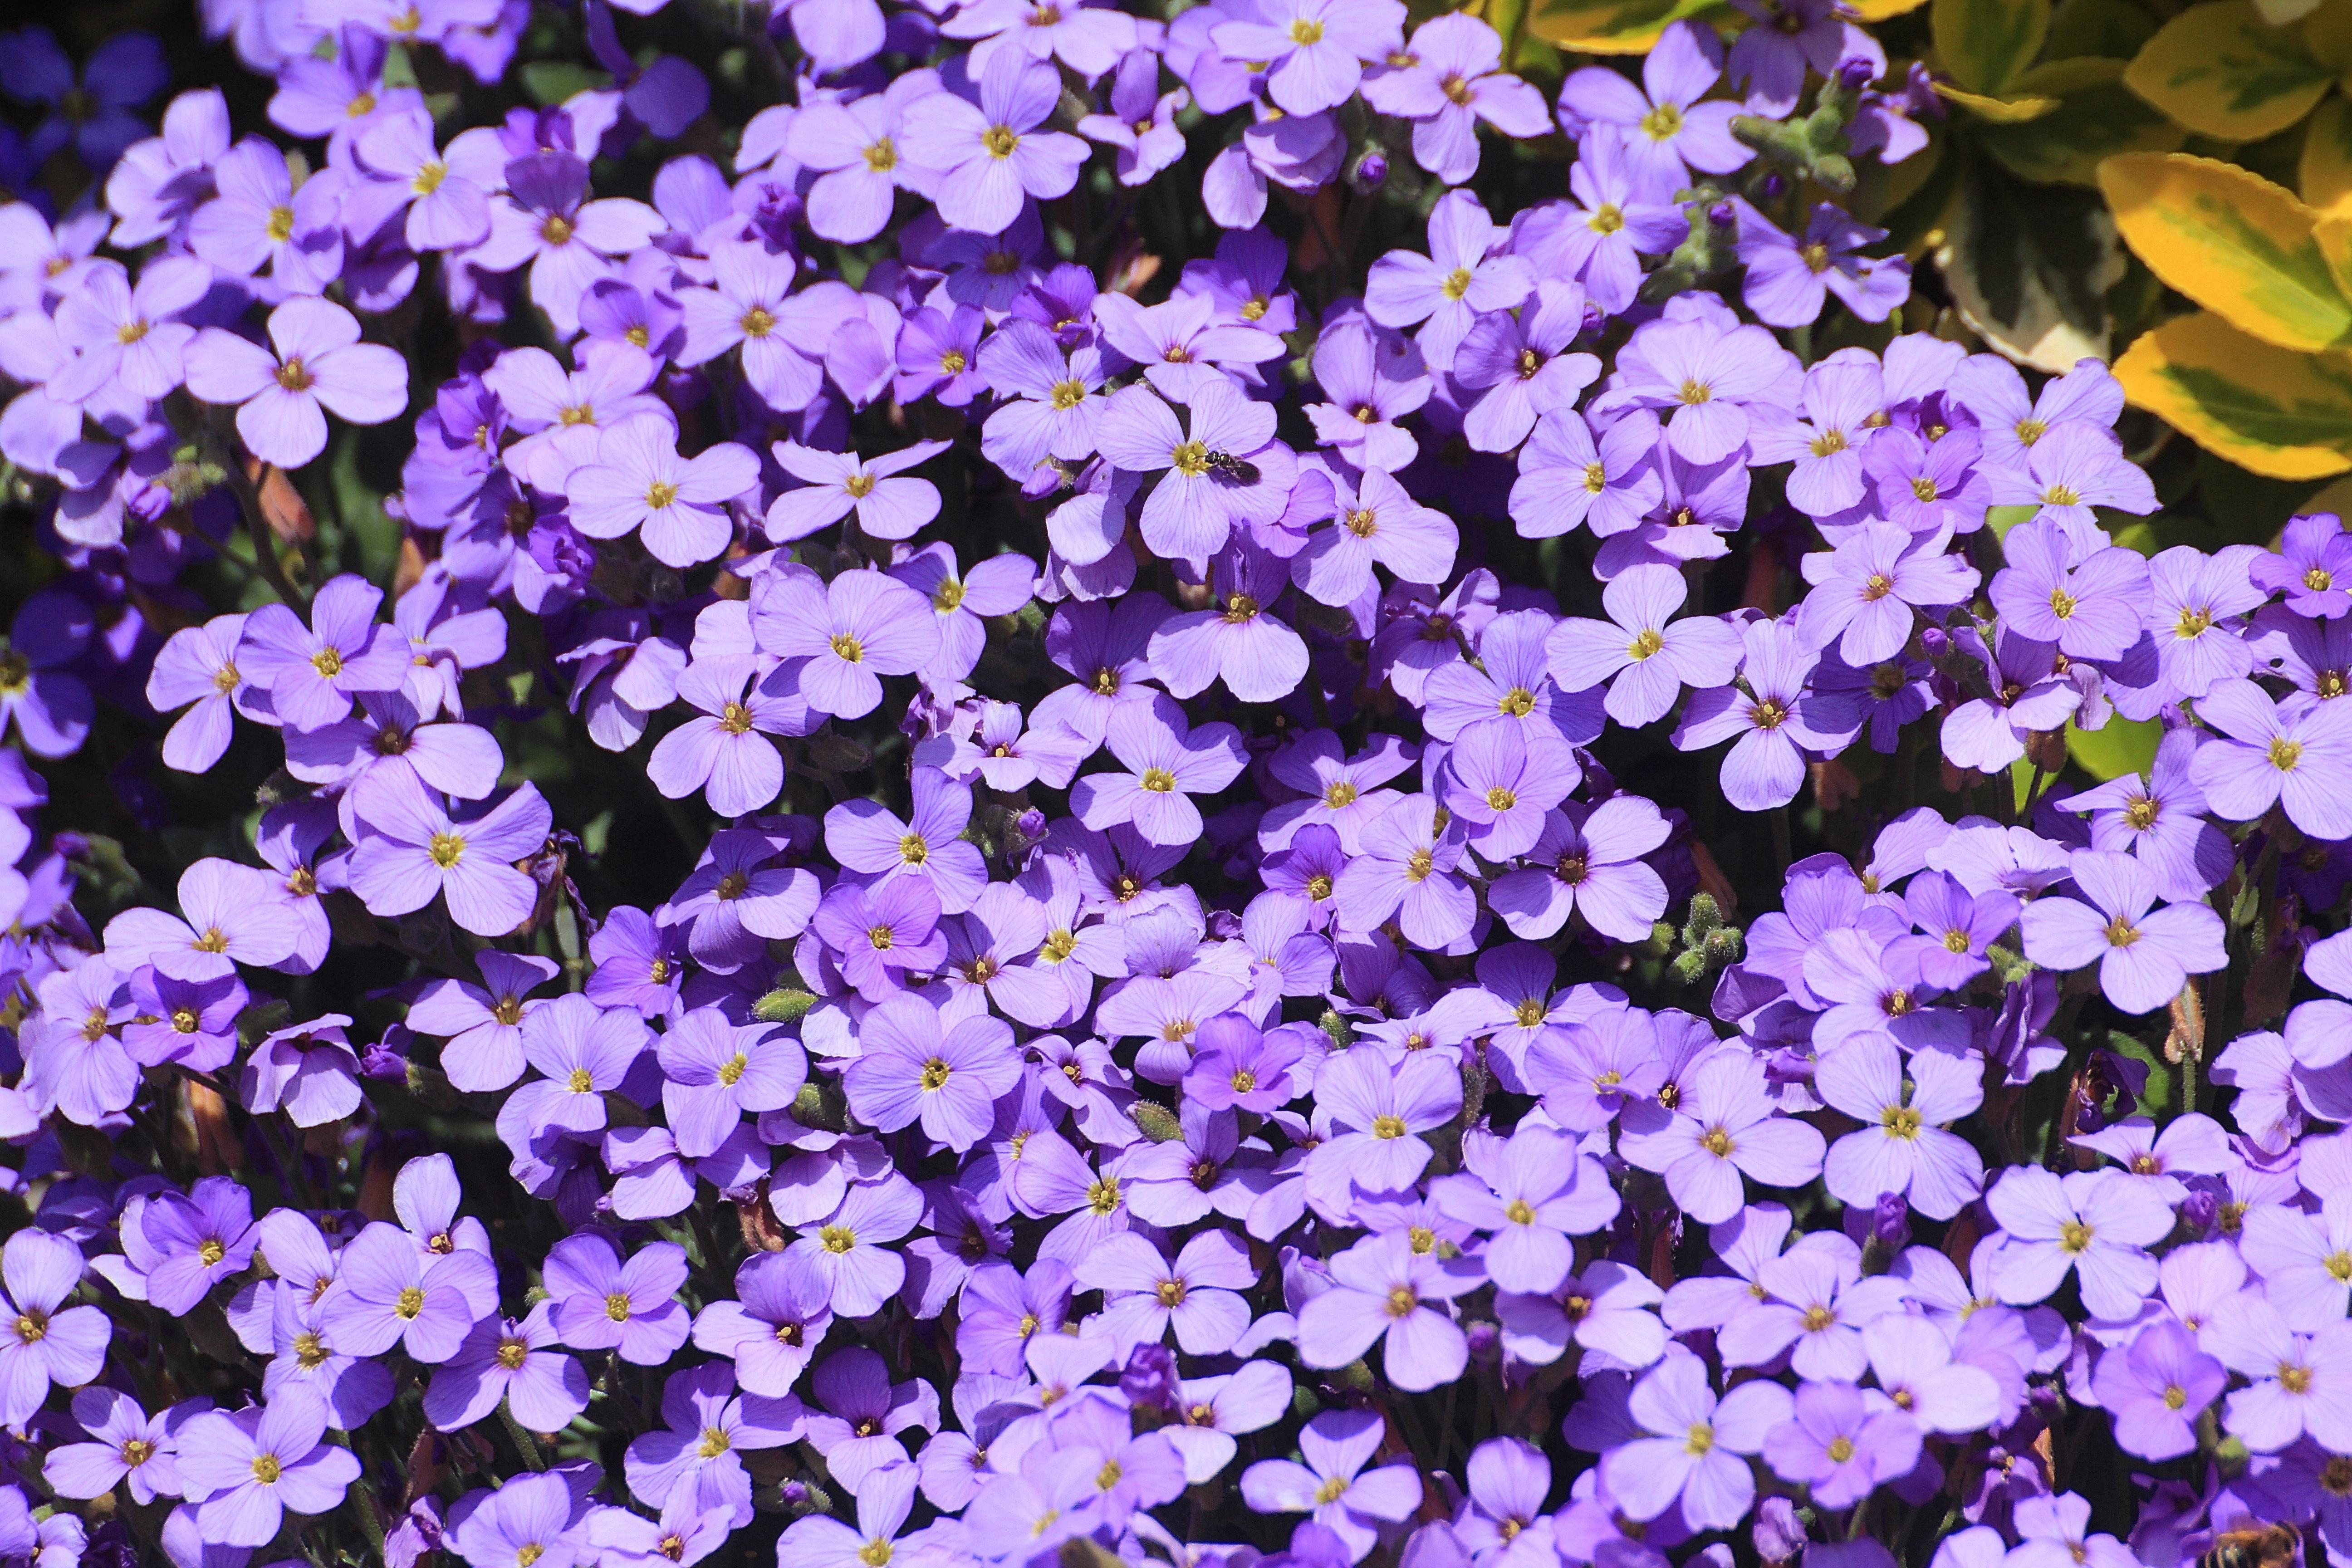 kostenlose foto bl hen lila bl tenblatt fr hling botanik flora violett sch n kurz. Black Bedroom Furniture Sets. Home Design Ideas